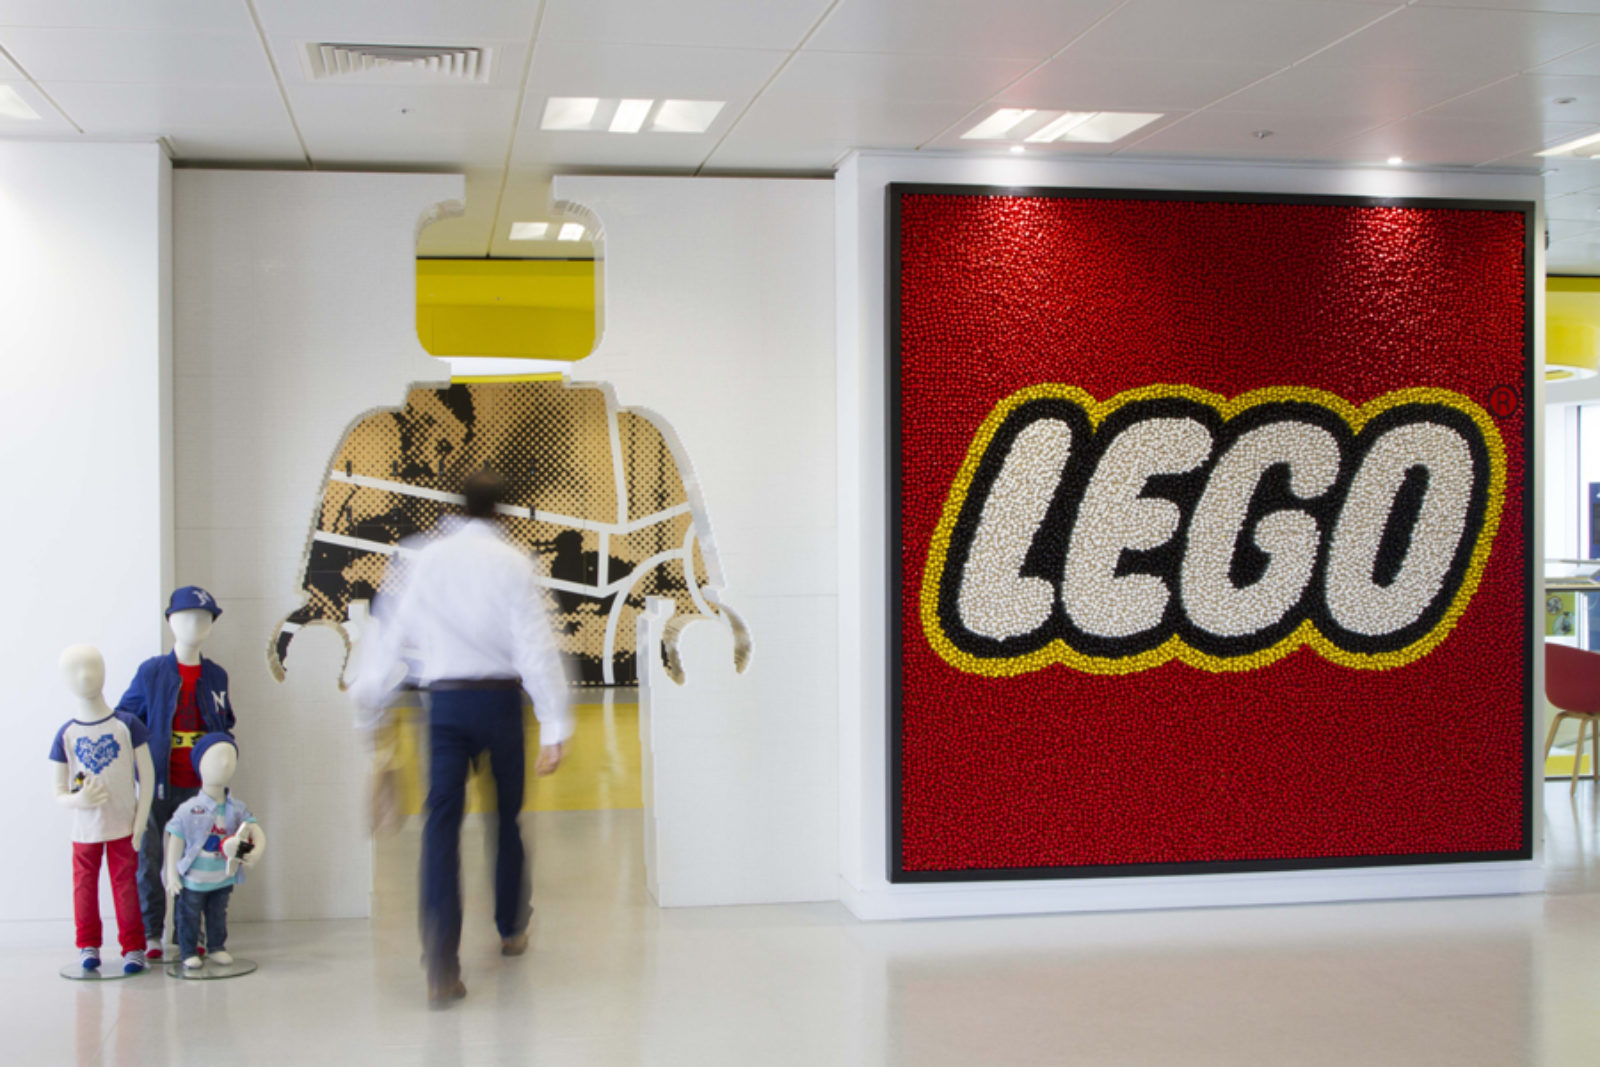 SFI_CS2_Image1_LEGO.jpg